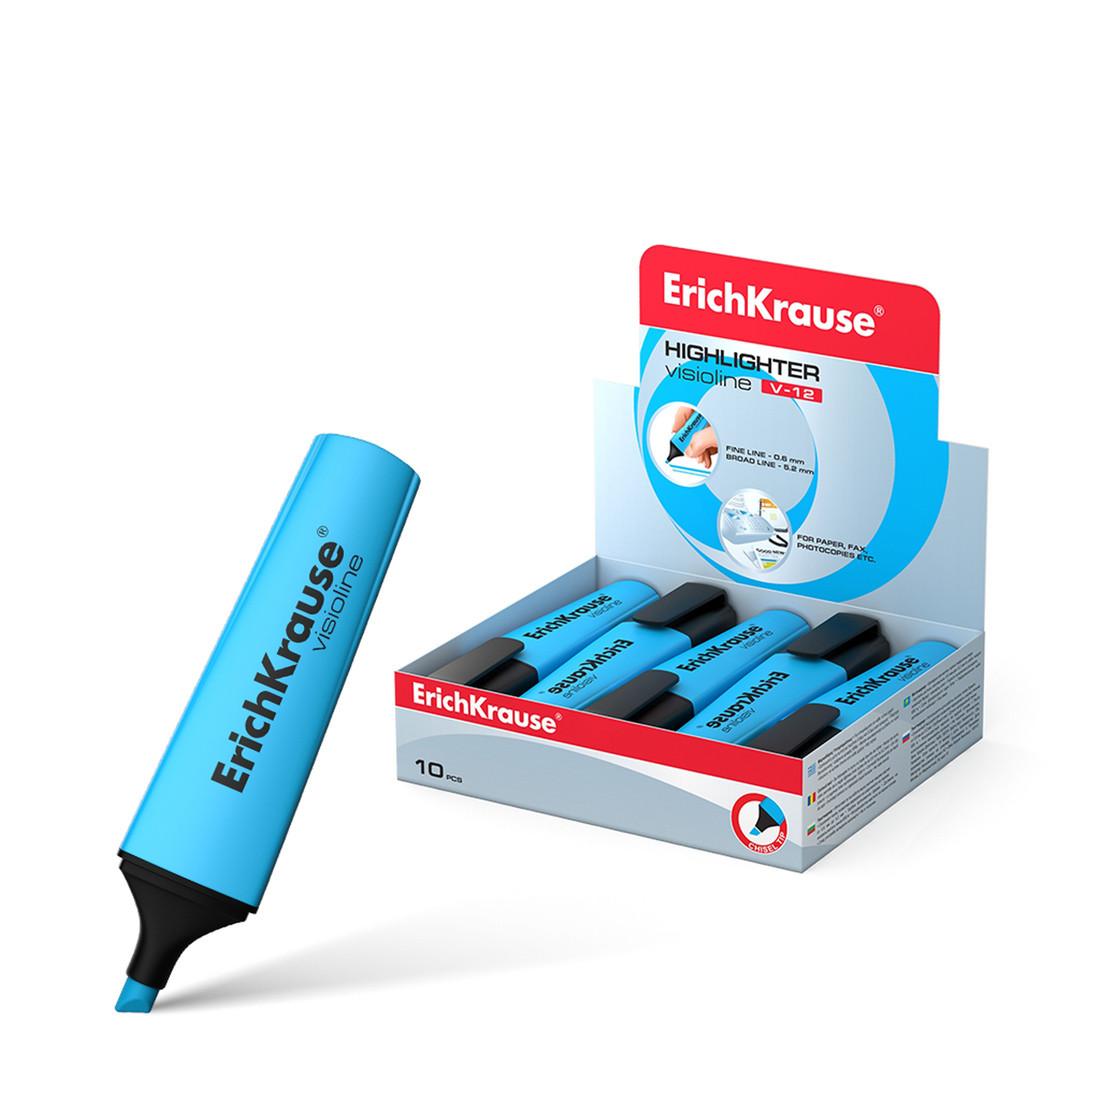 Текстмаркер ErichKrause® 32500 Visioline V-12 цвет чернил голубой